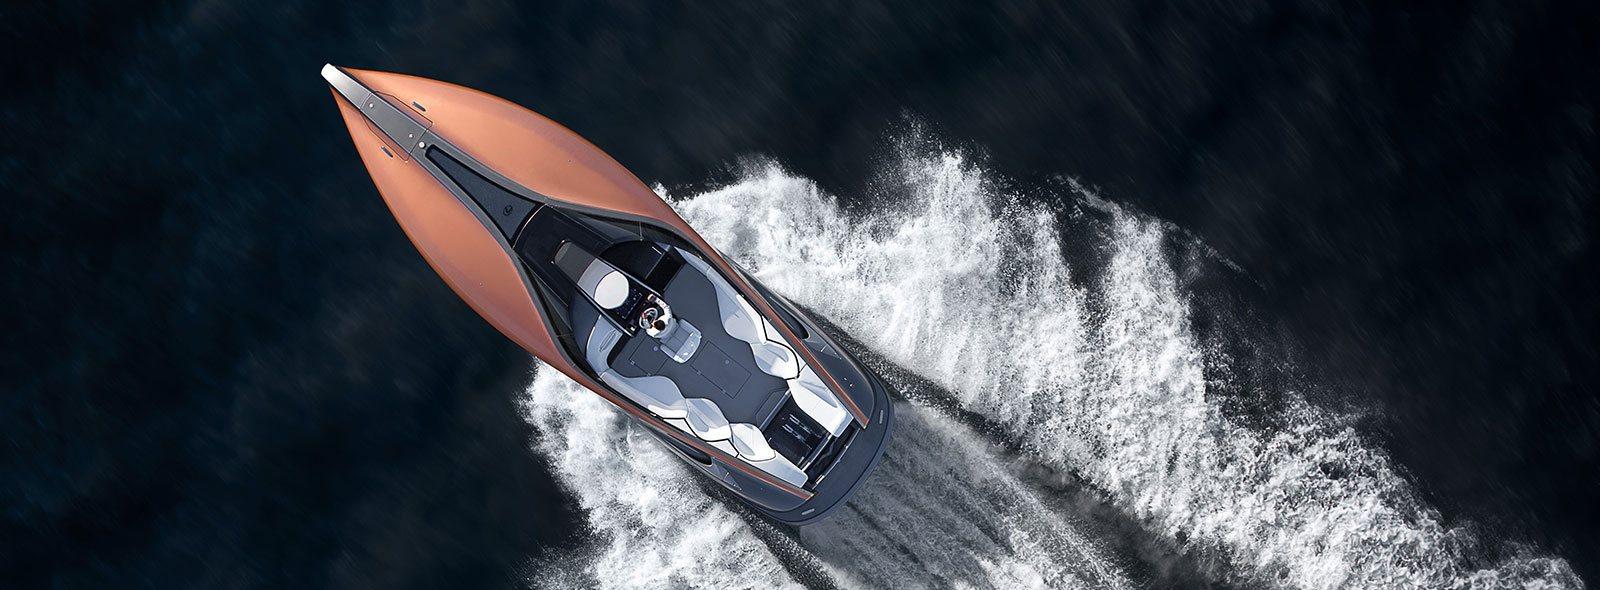 Vista cenital del yate color naranja en el mar